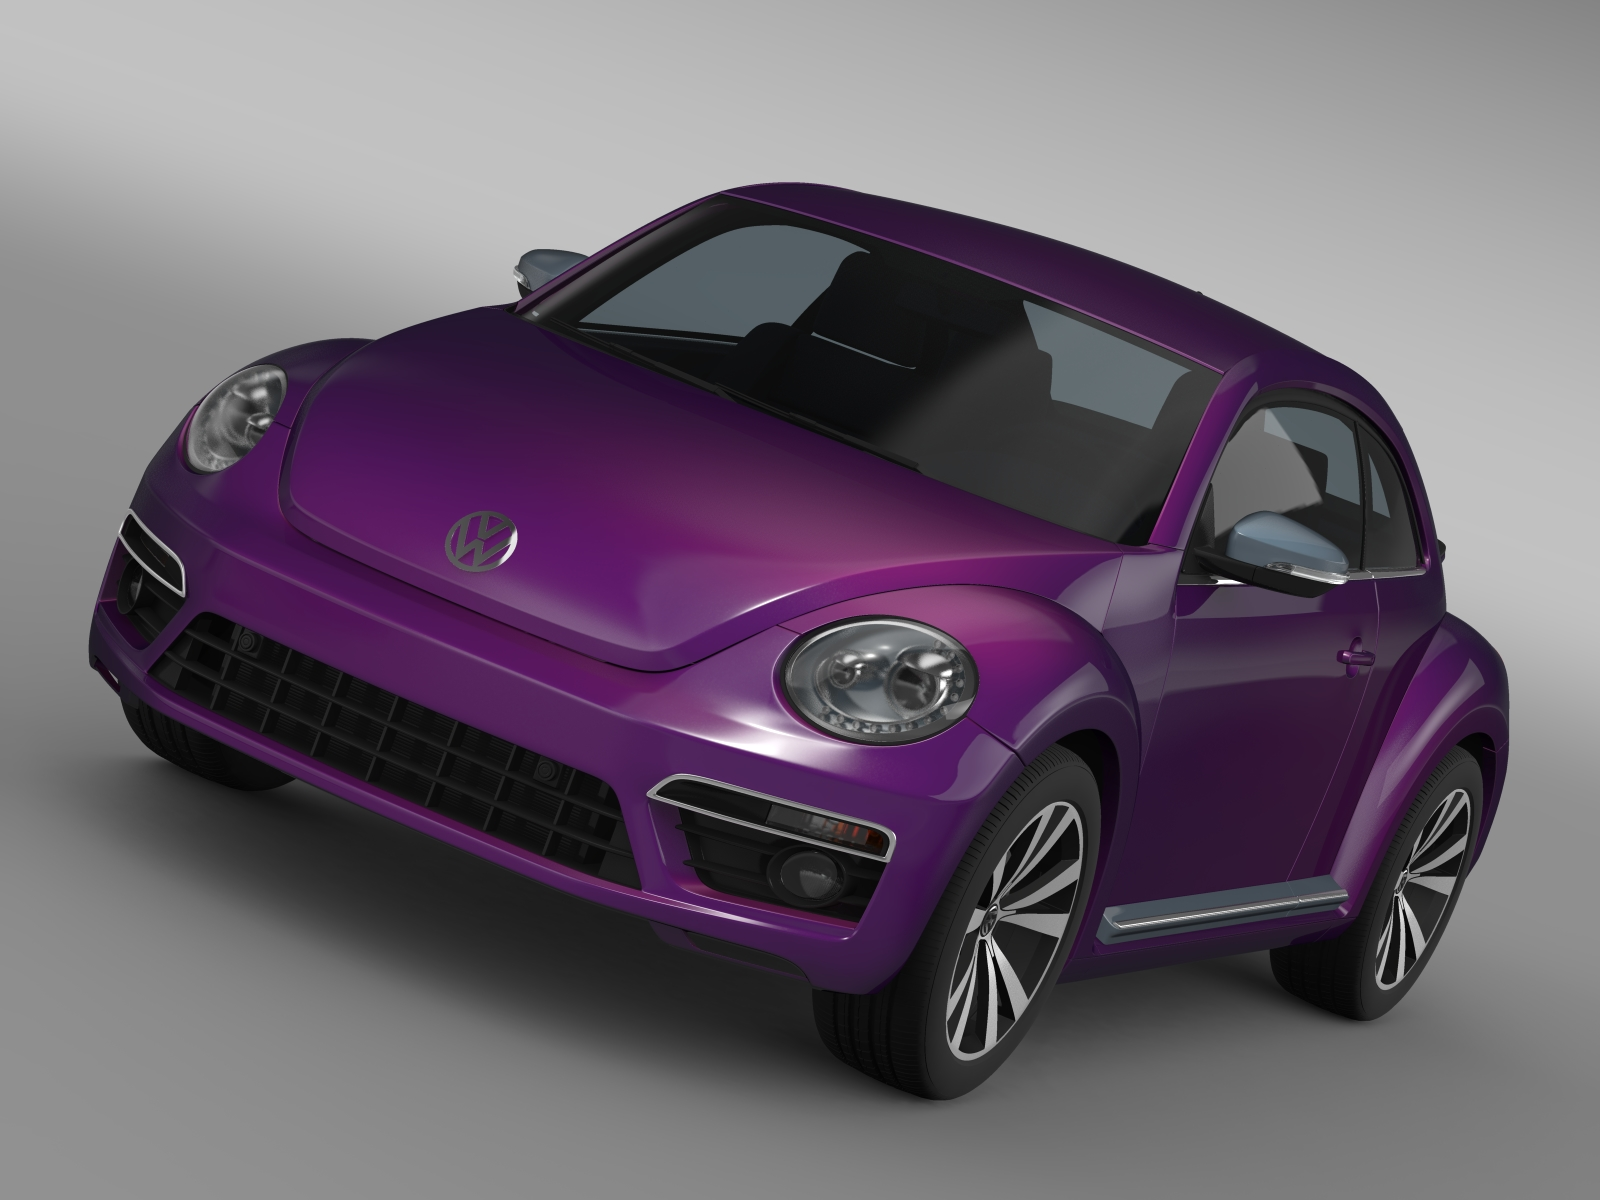 vw beetle pink edition concept 2015 3d model 3ds max fbx c4d lwo ma mb hrc xsi obj 208786